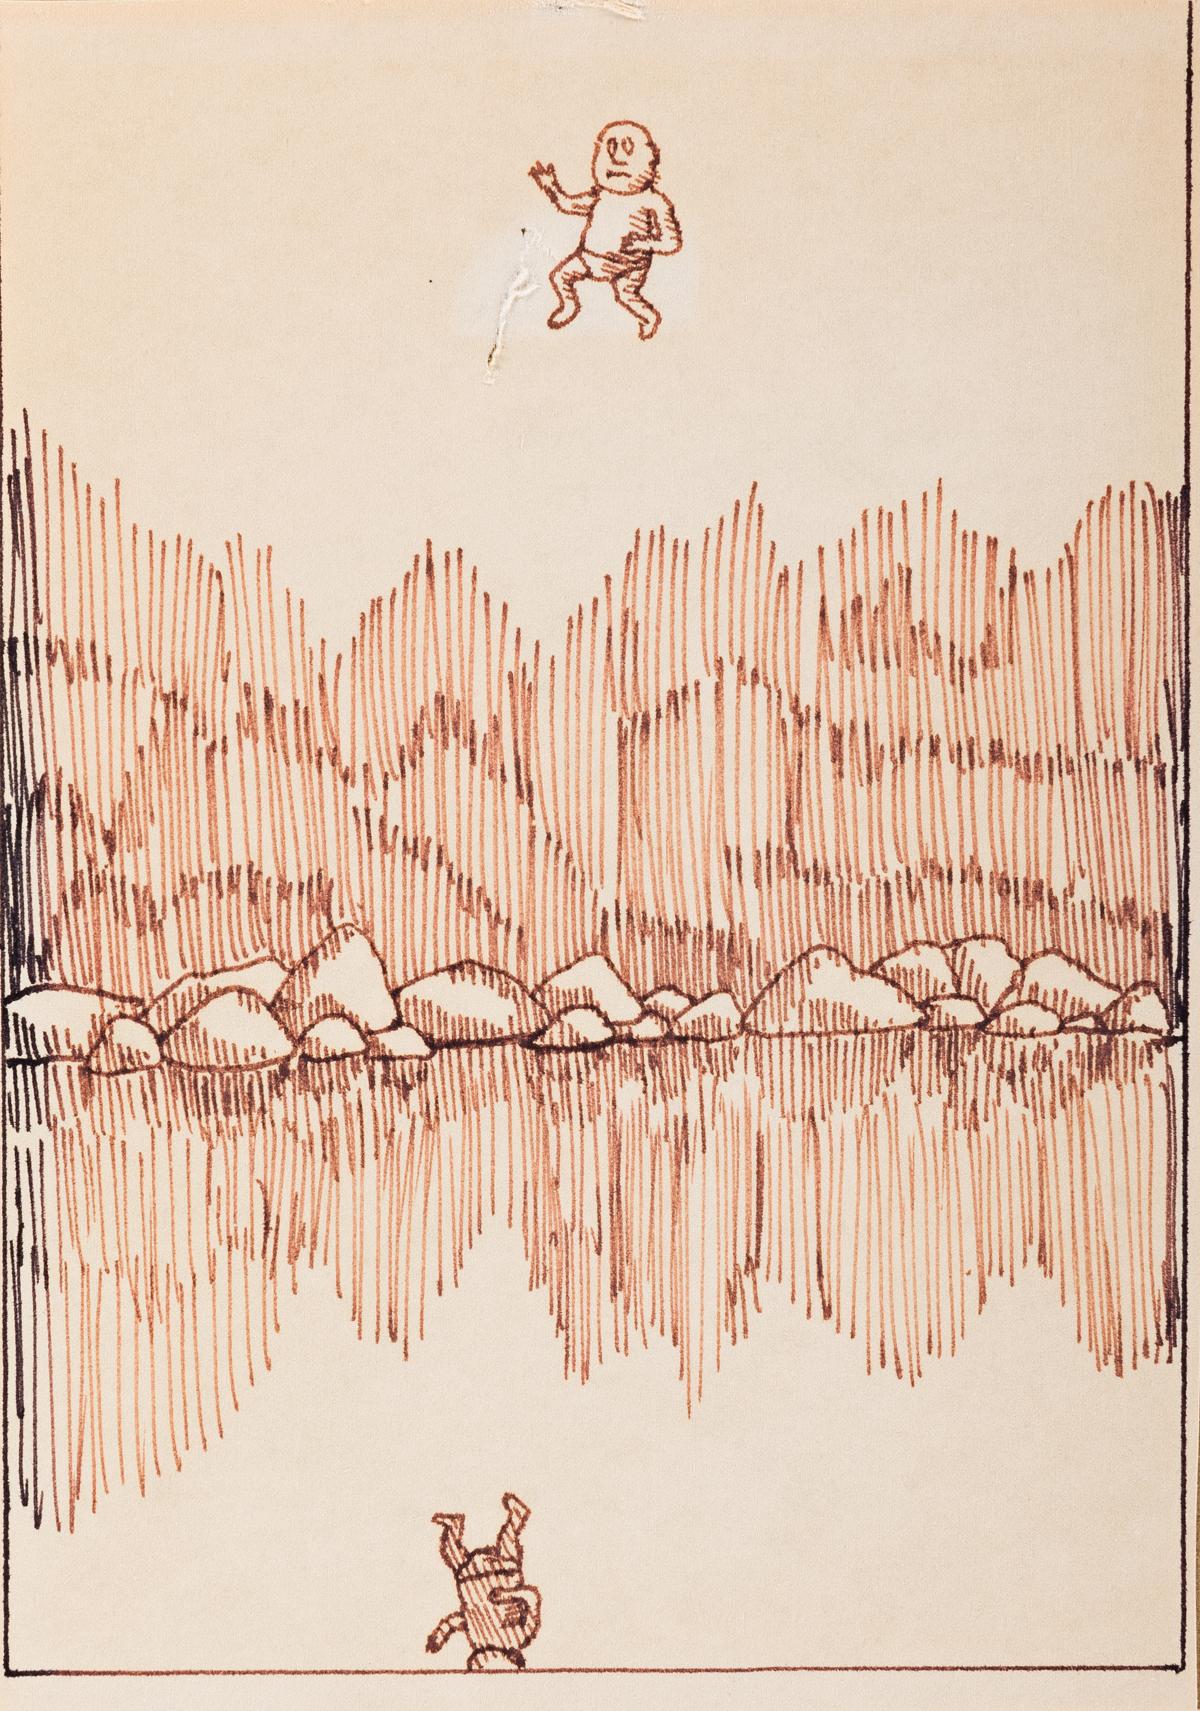 DAVID-WOJNAROWICZ-(1954---1992)-Group-of-6-drawings